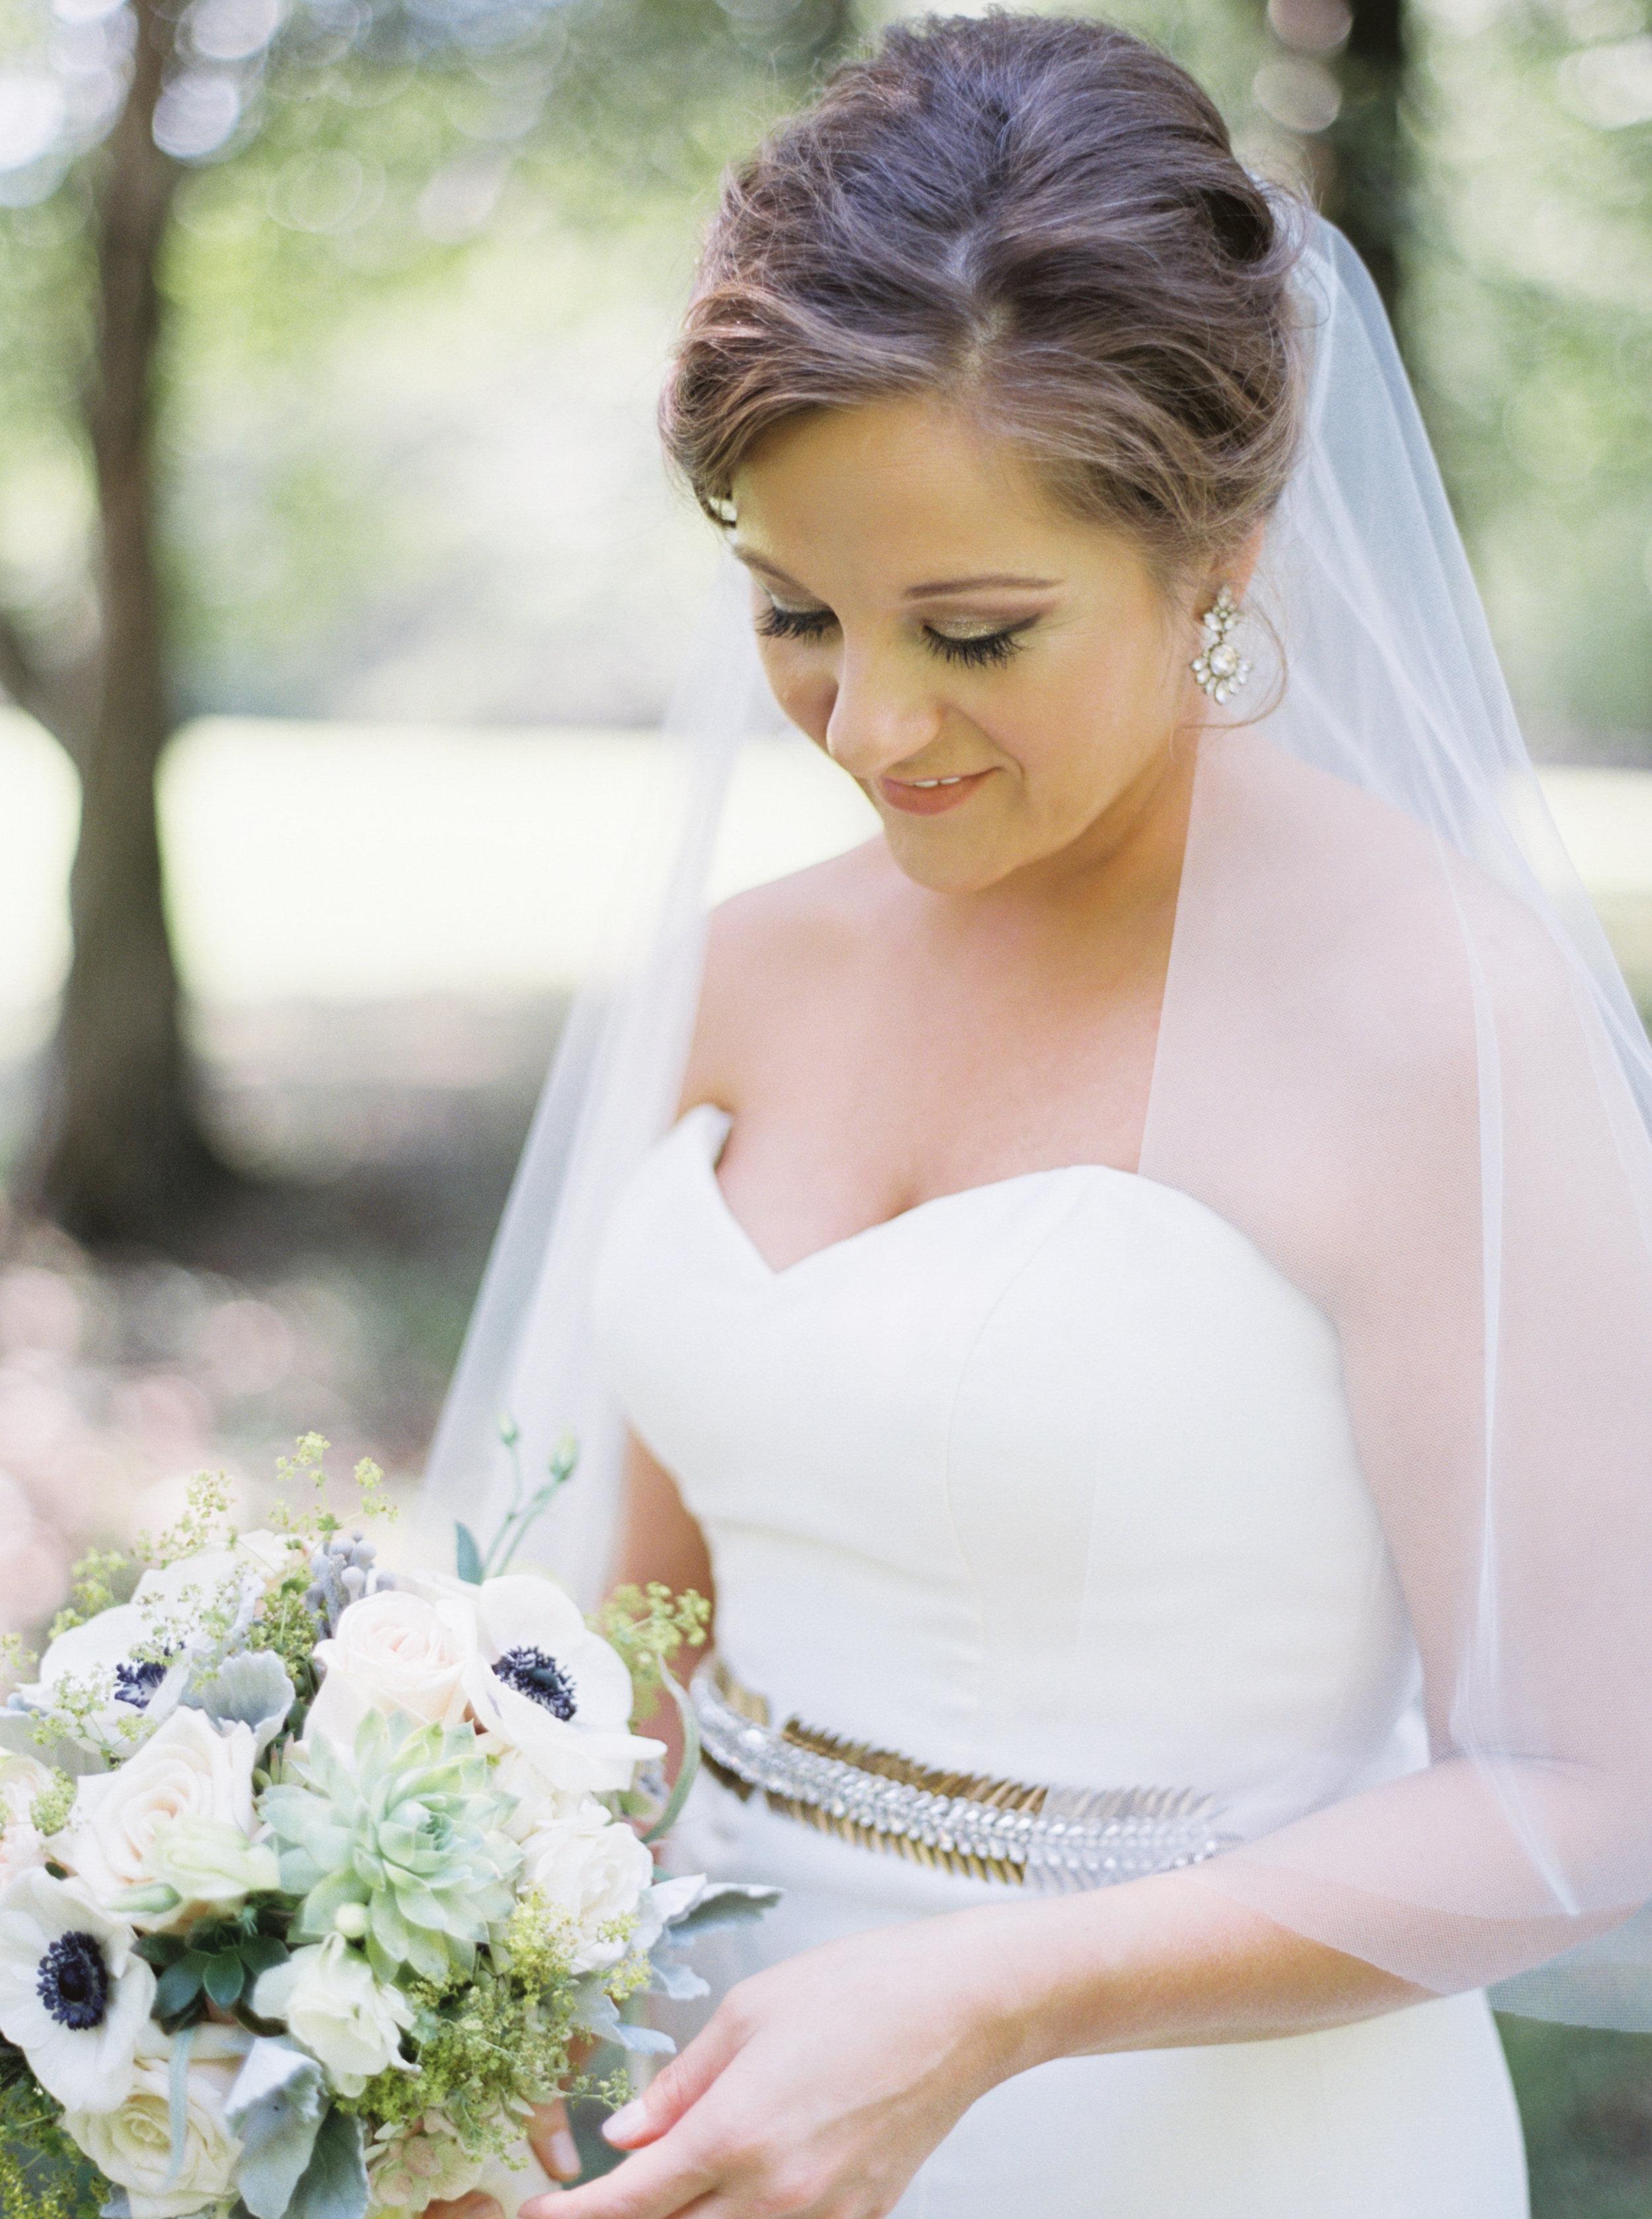 stephanie and taylor wedding-bride bridesmaids-0001.jpg